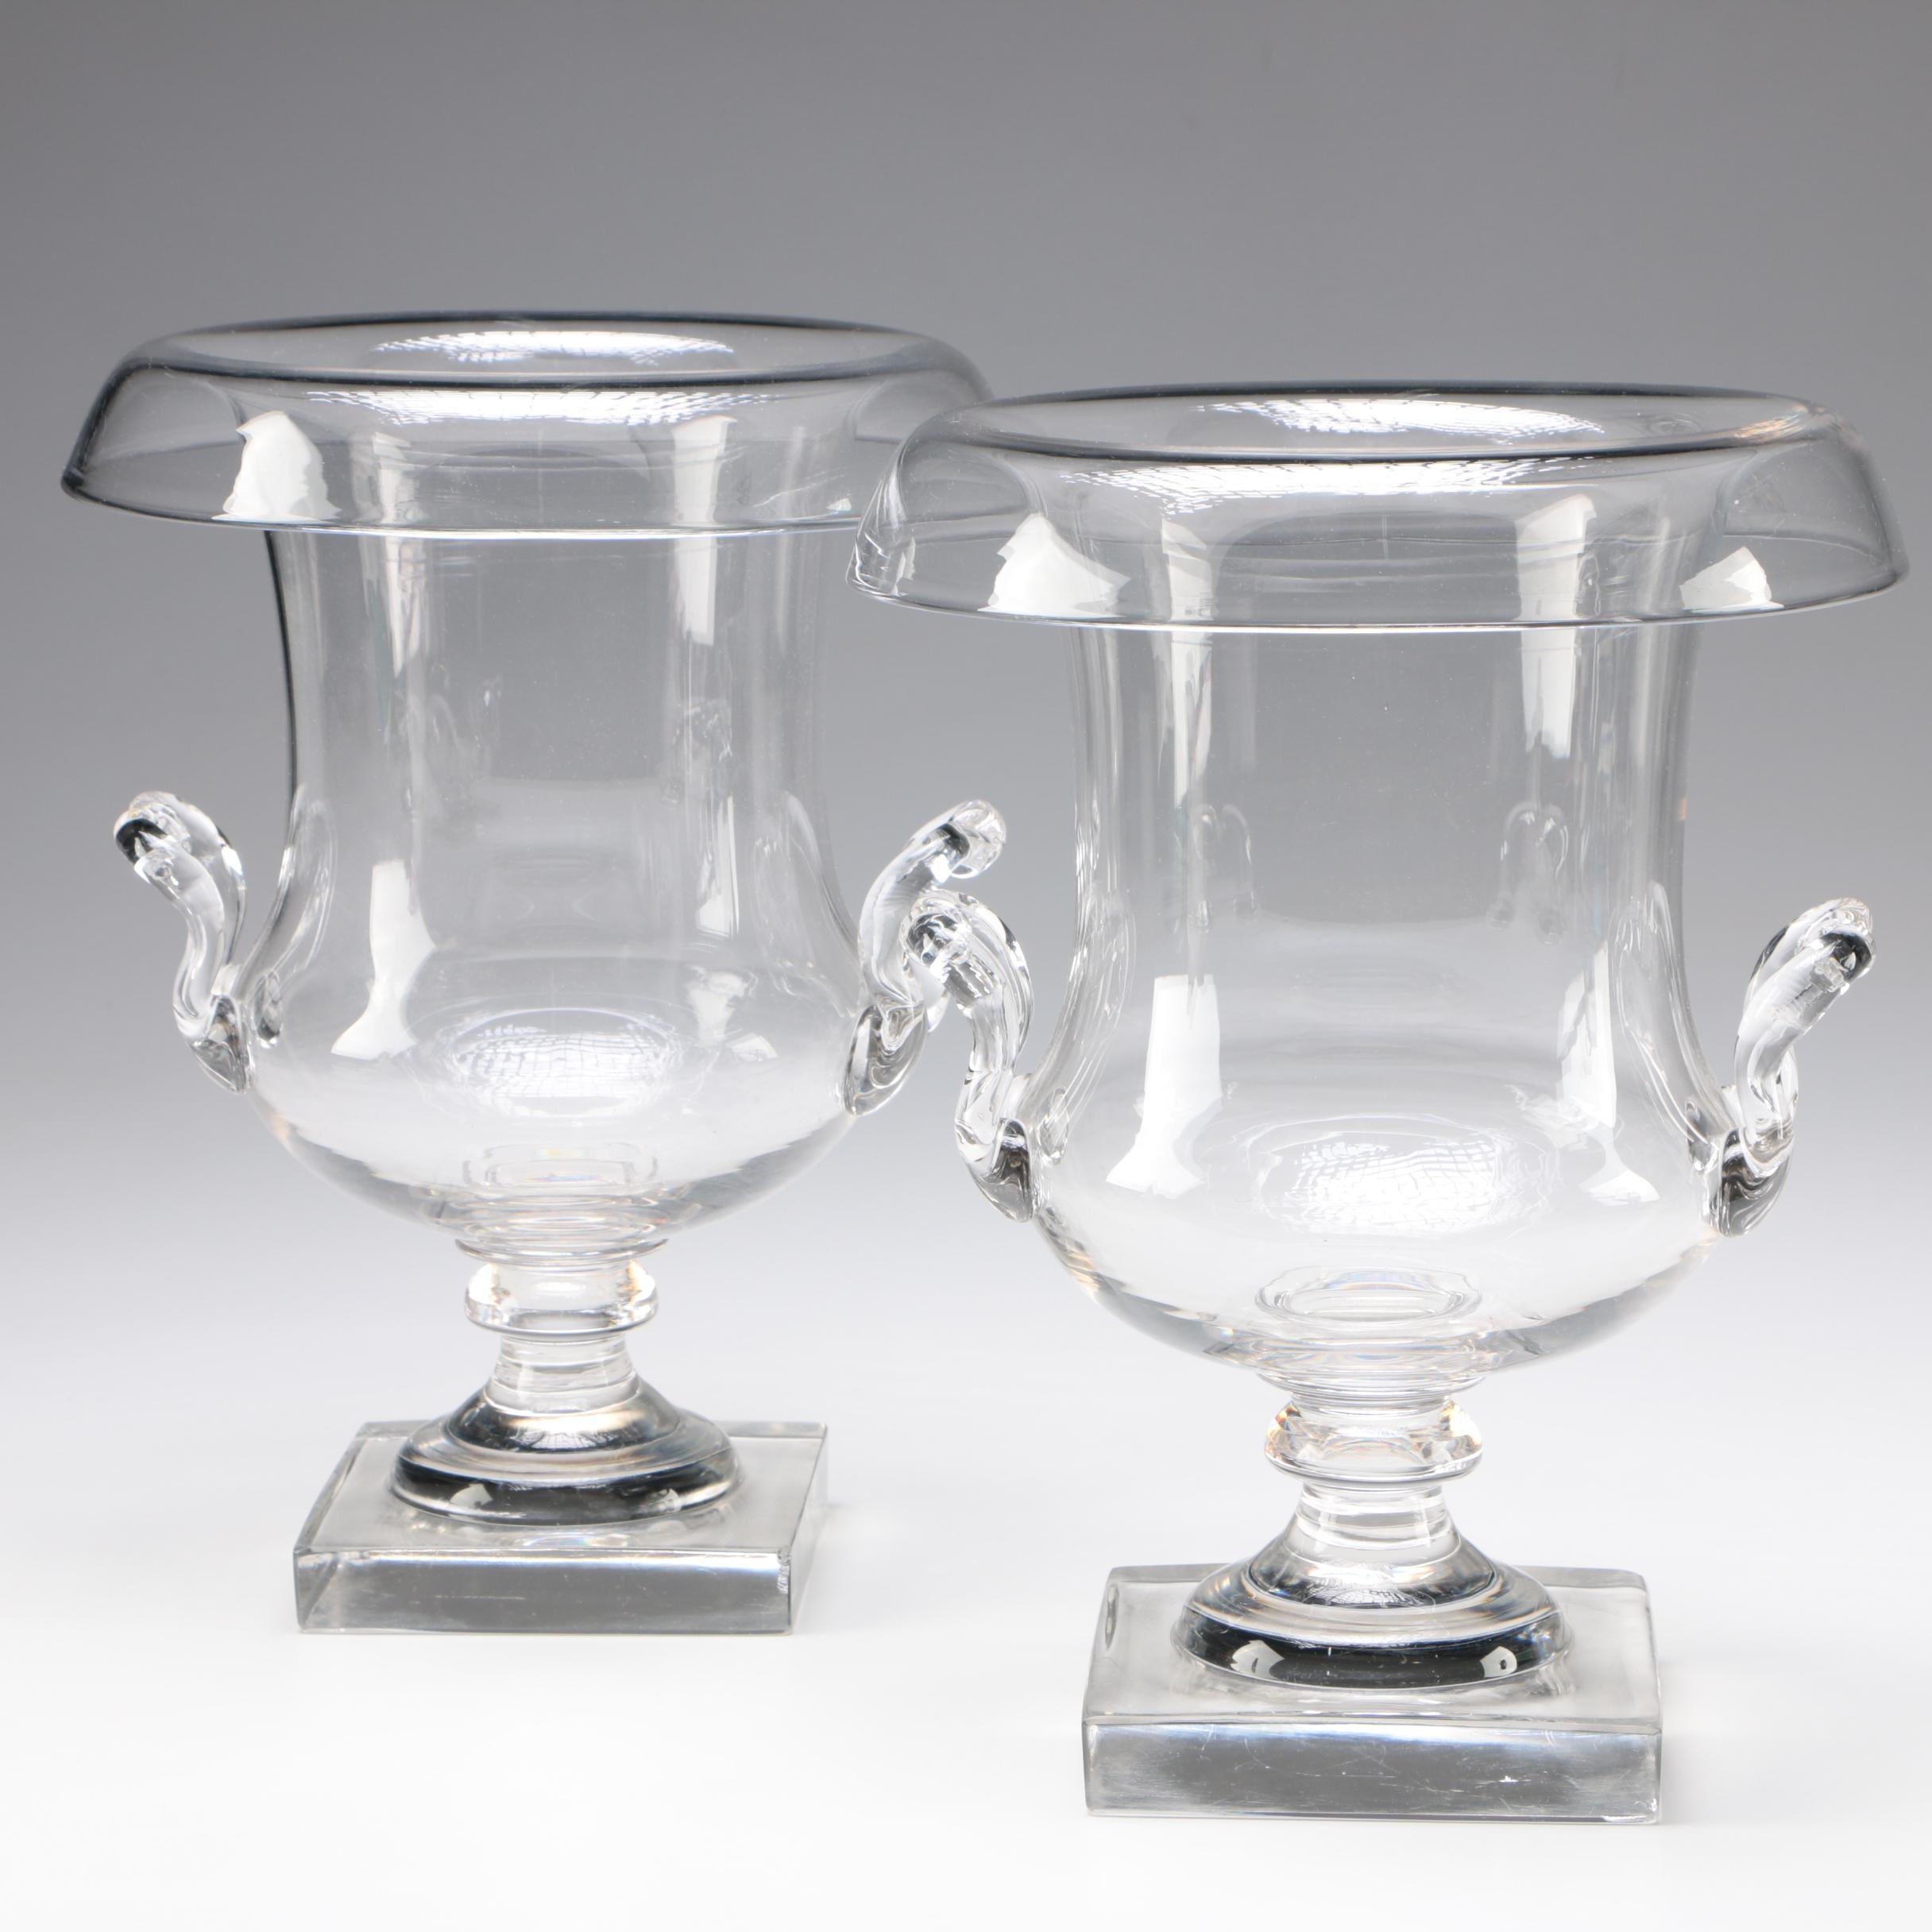 Pair of Art Glass Urn Form Vases